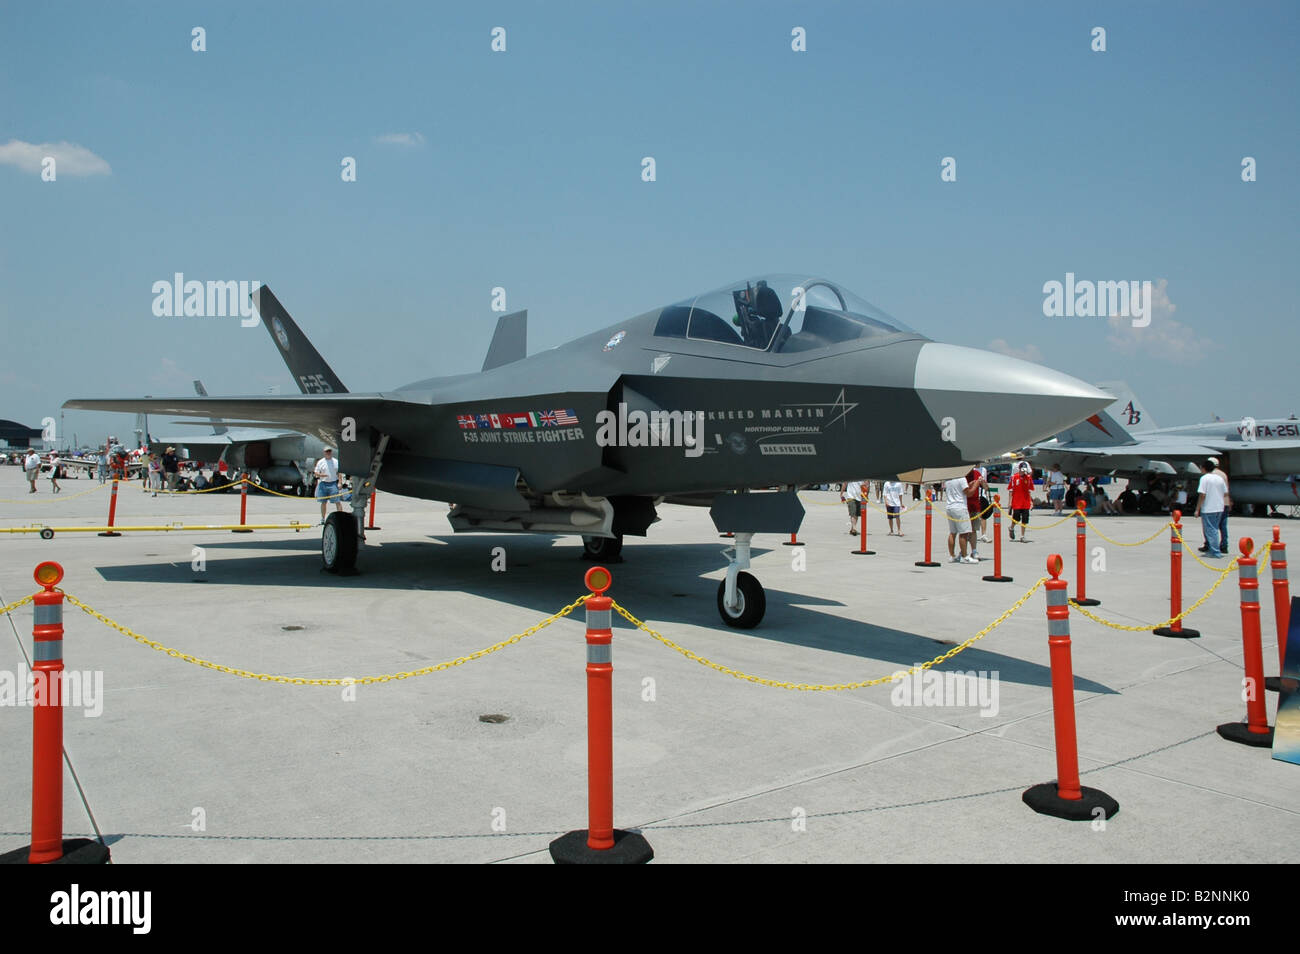 F-35 Lightning Joint Strike Fighter - Stock Image